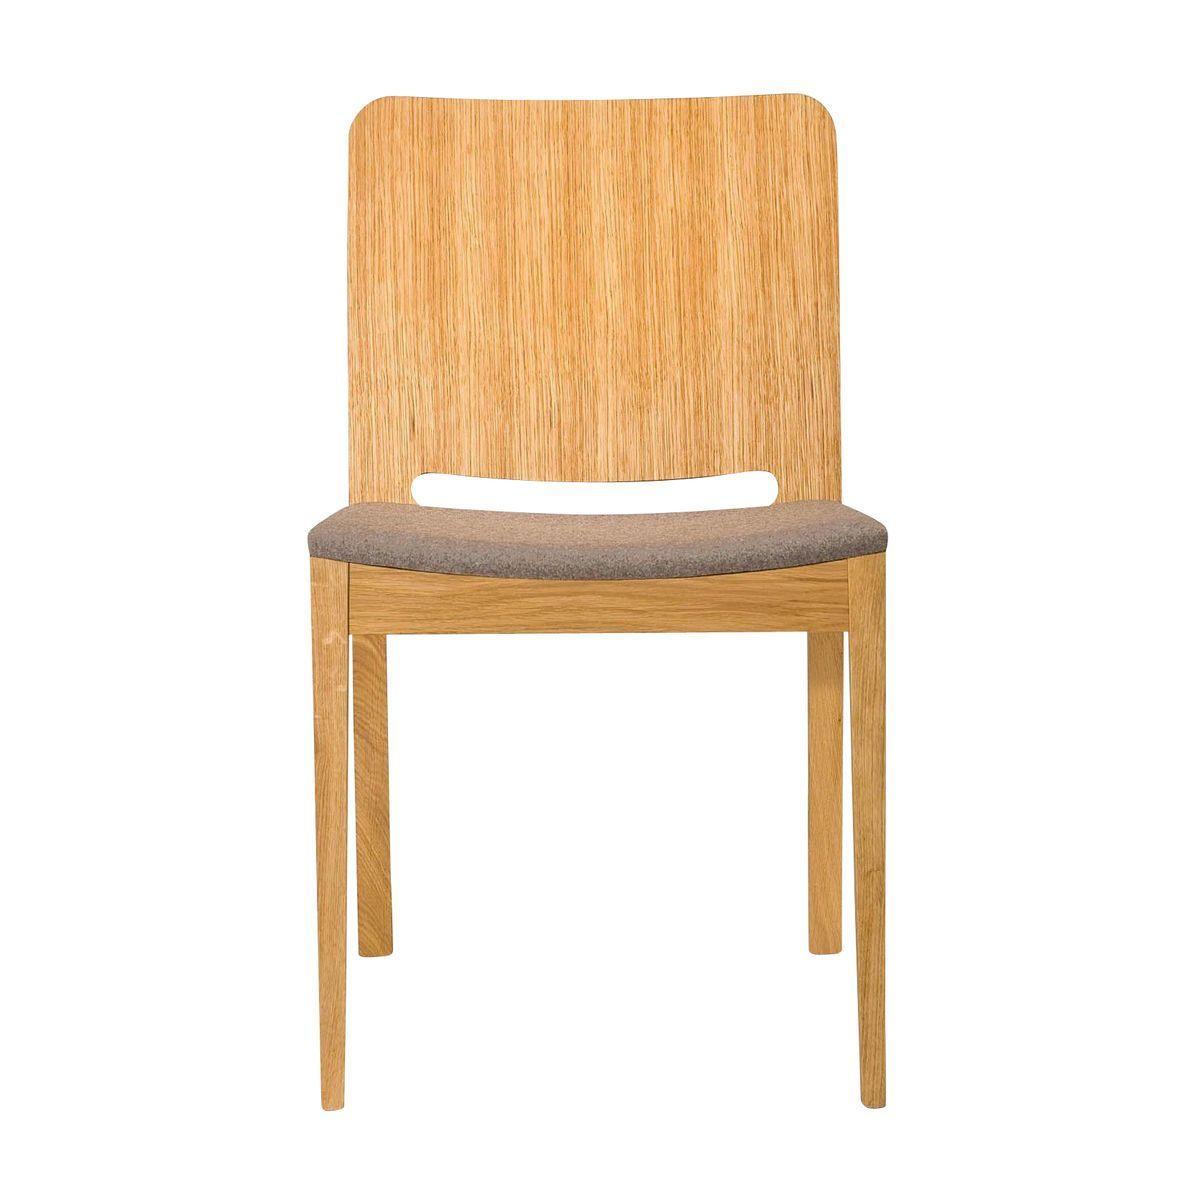 kelley stoel jan kurtz. Black Bedroom Furniture Sets. Home Design Ideas